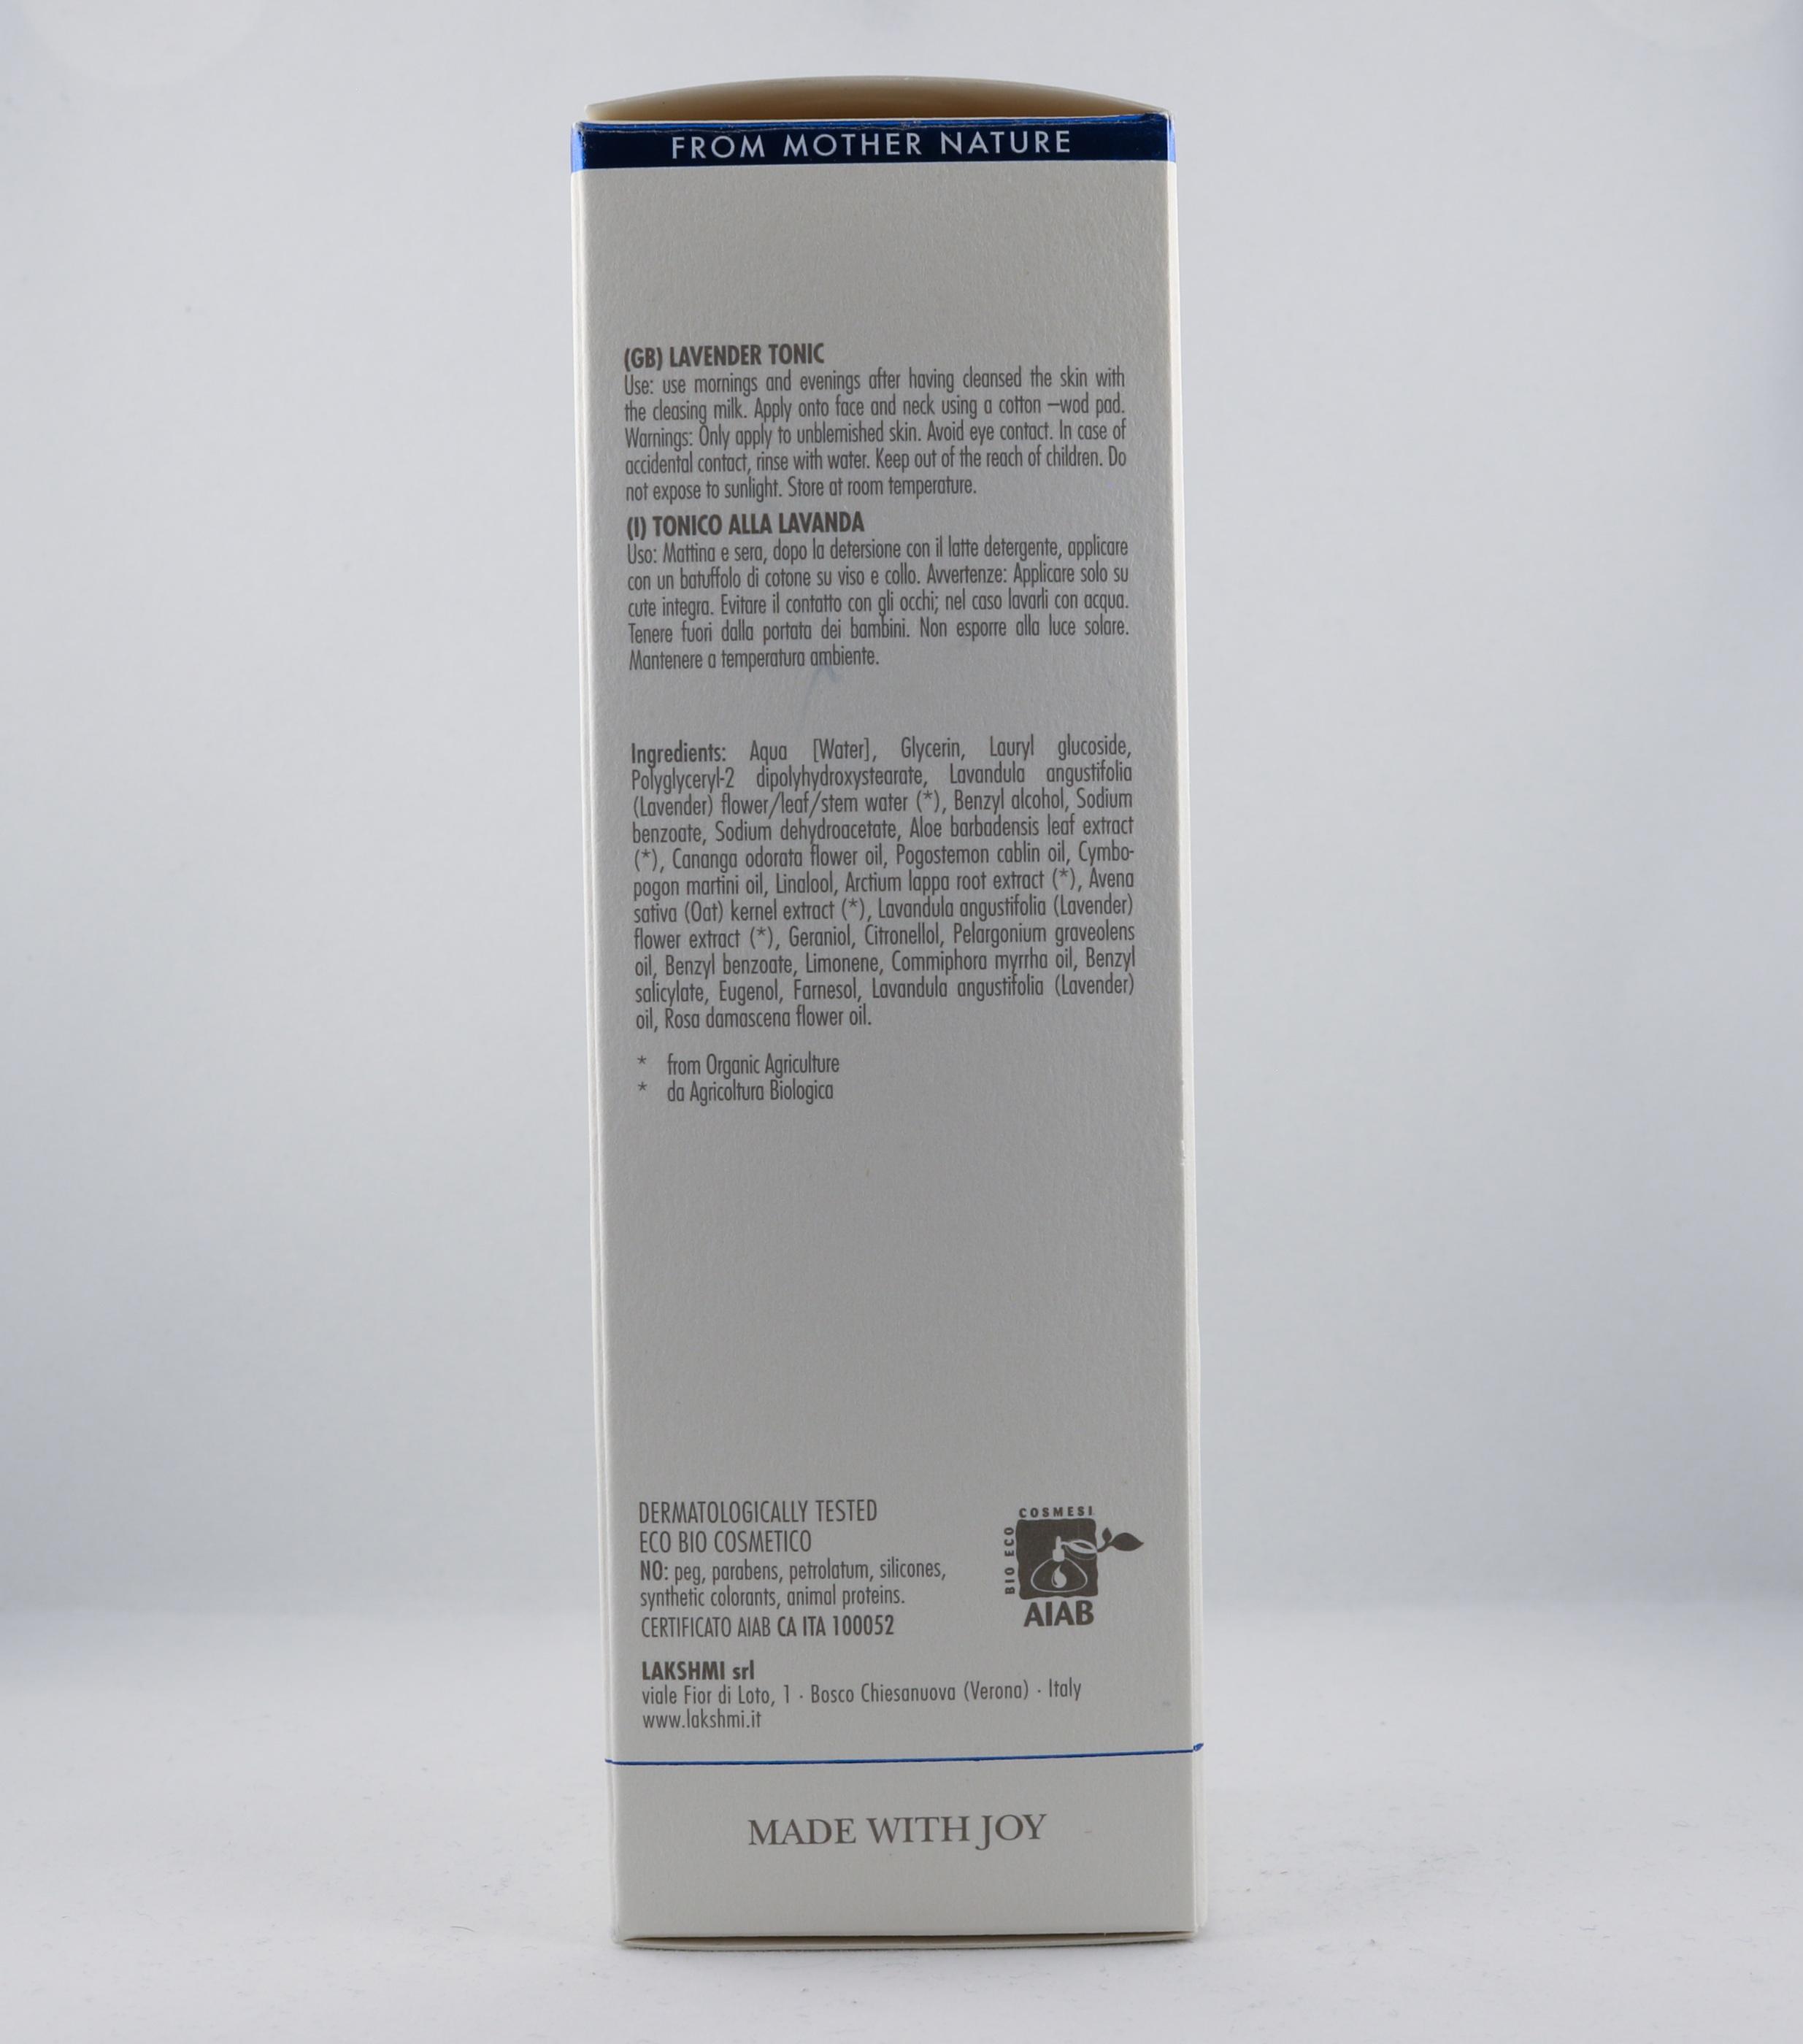 Pitta Lavendel Tonic wellness ayurveda halmstad sweden svensk hudvård